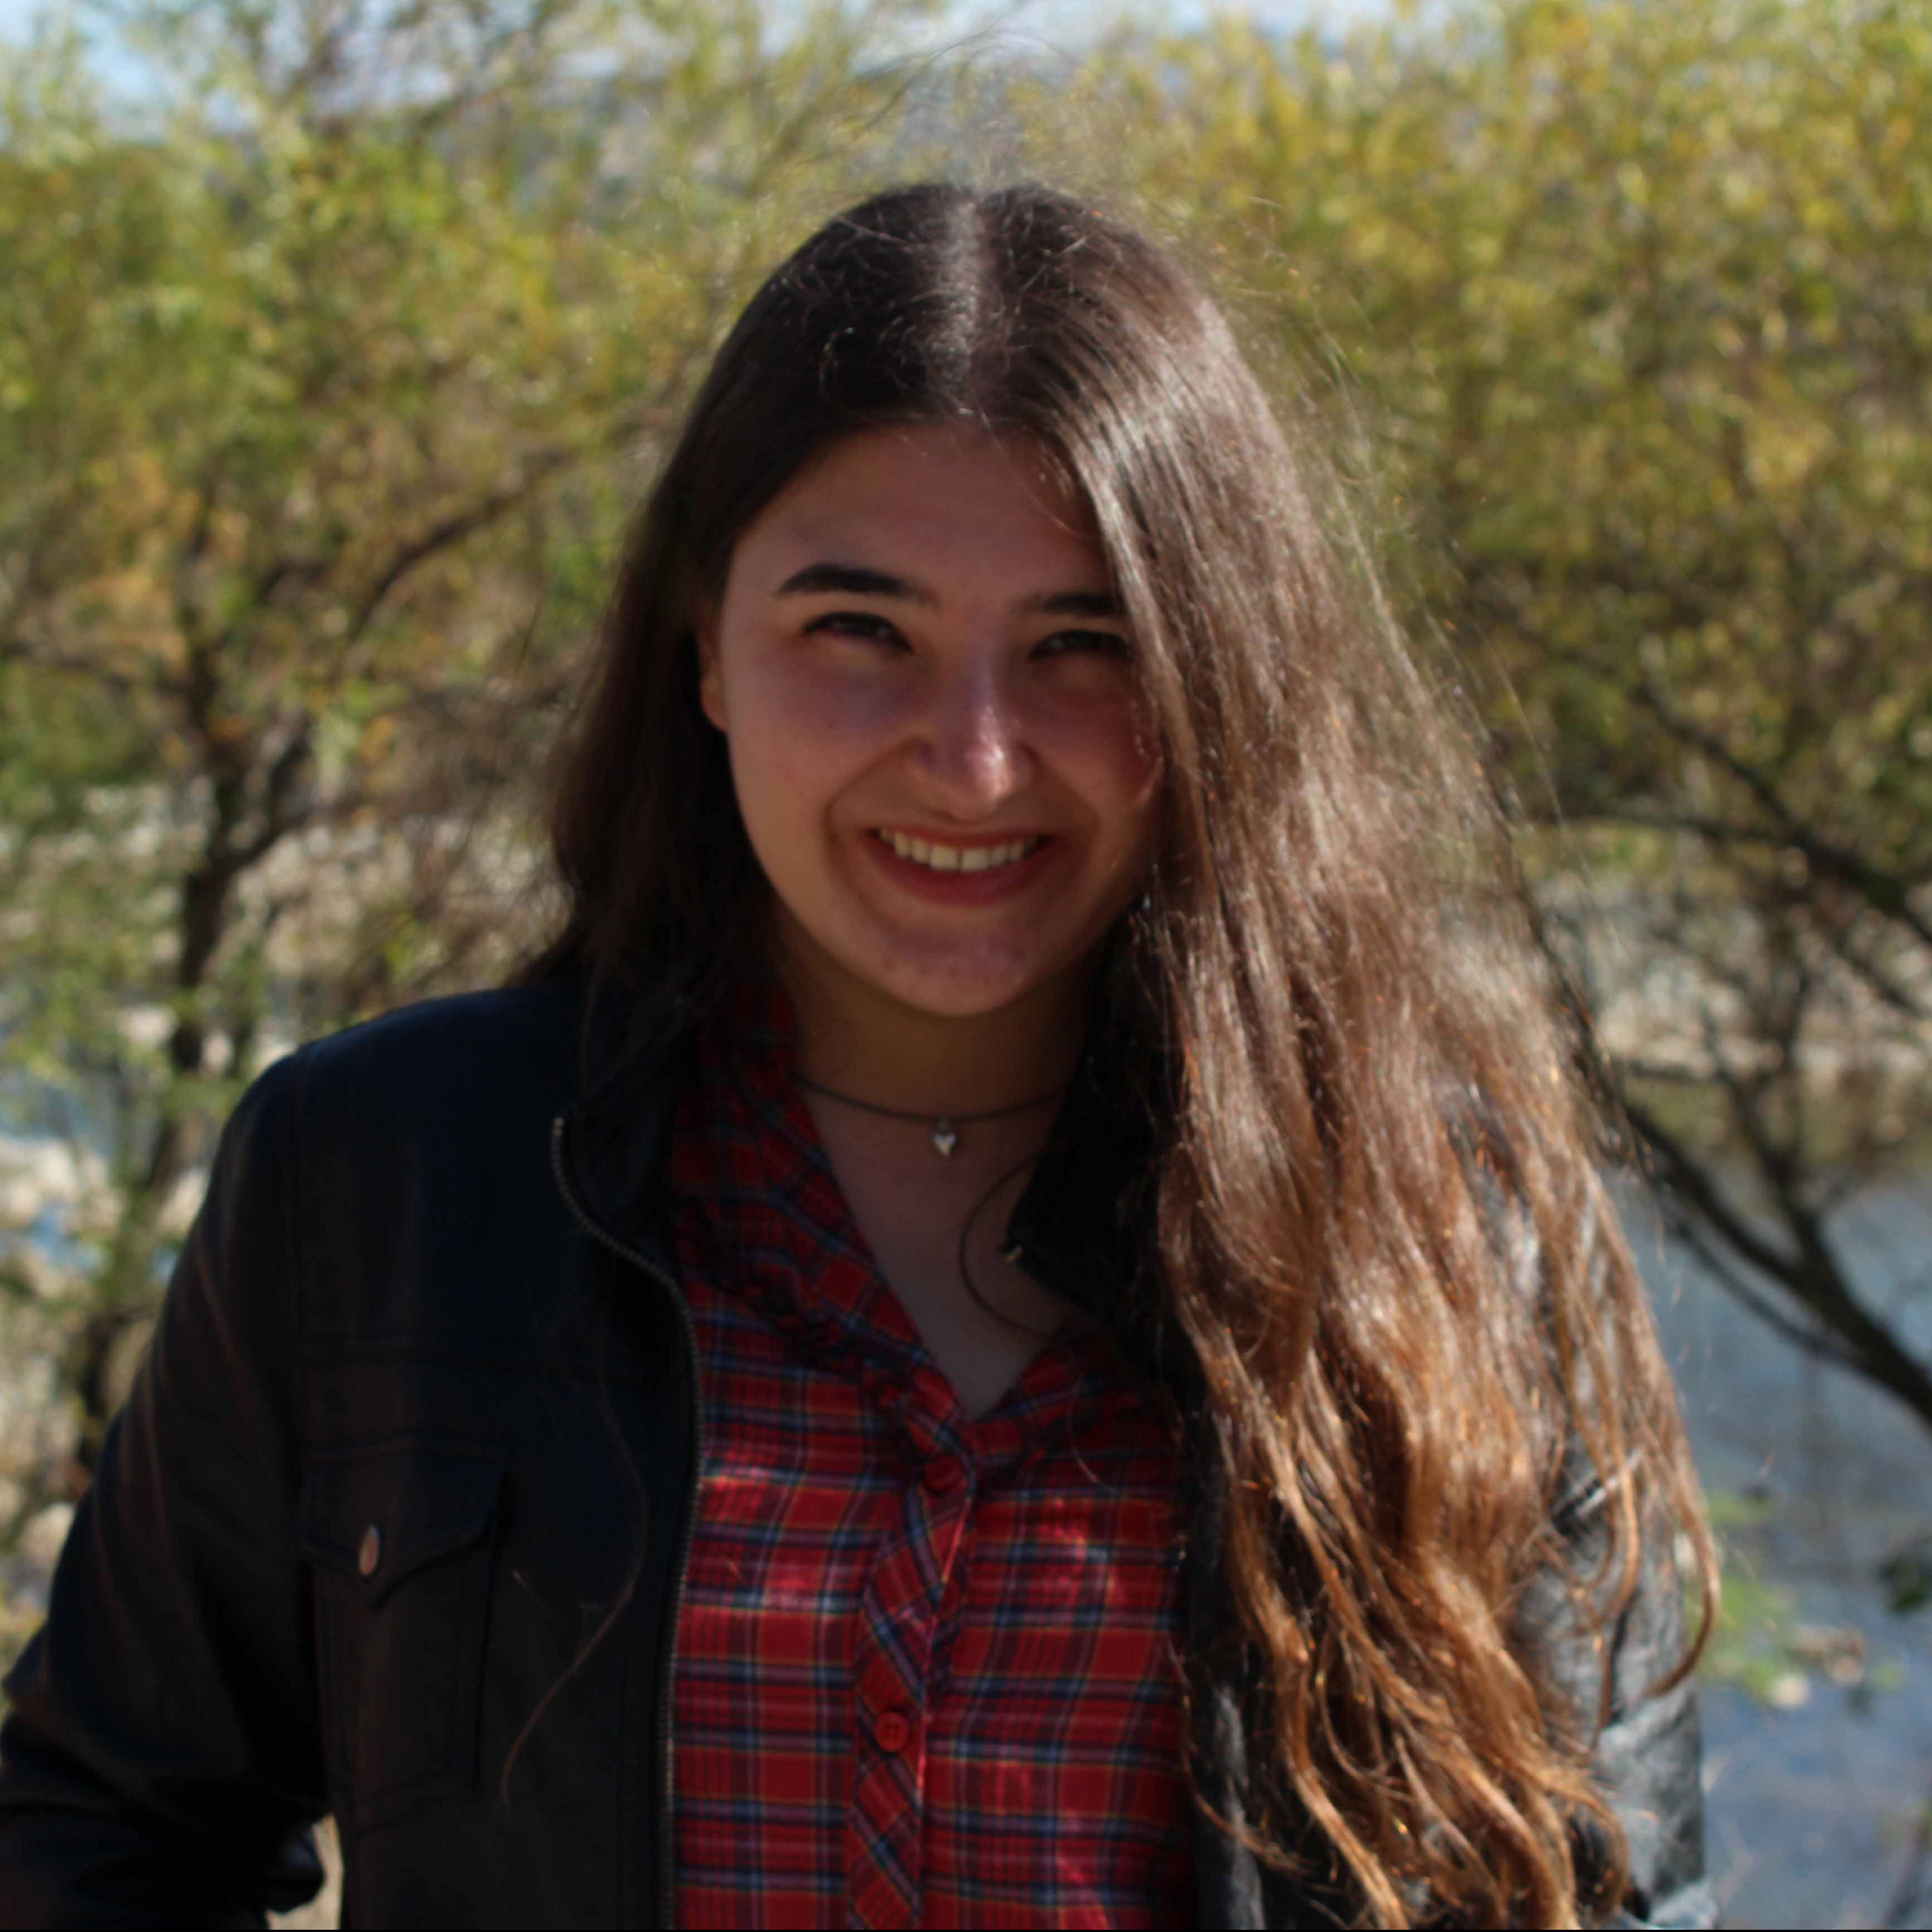 Ayşenur Baş, Undergraduate Student, Mimar Sinan Fine Arts University, Turkey